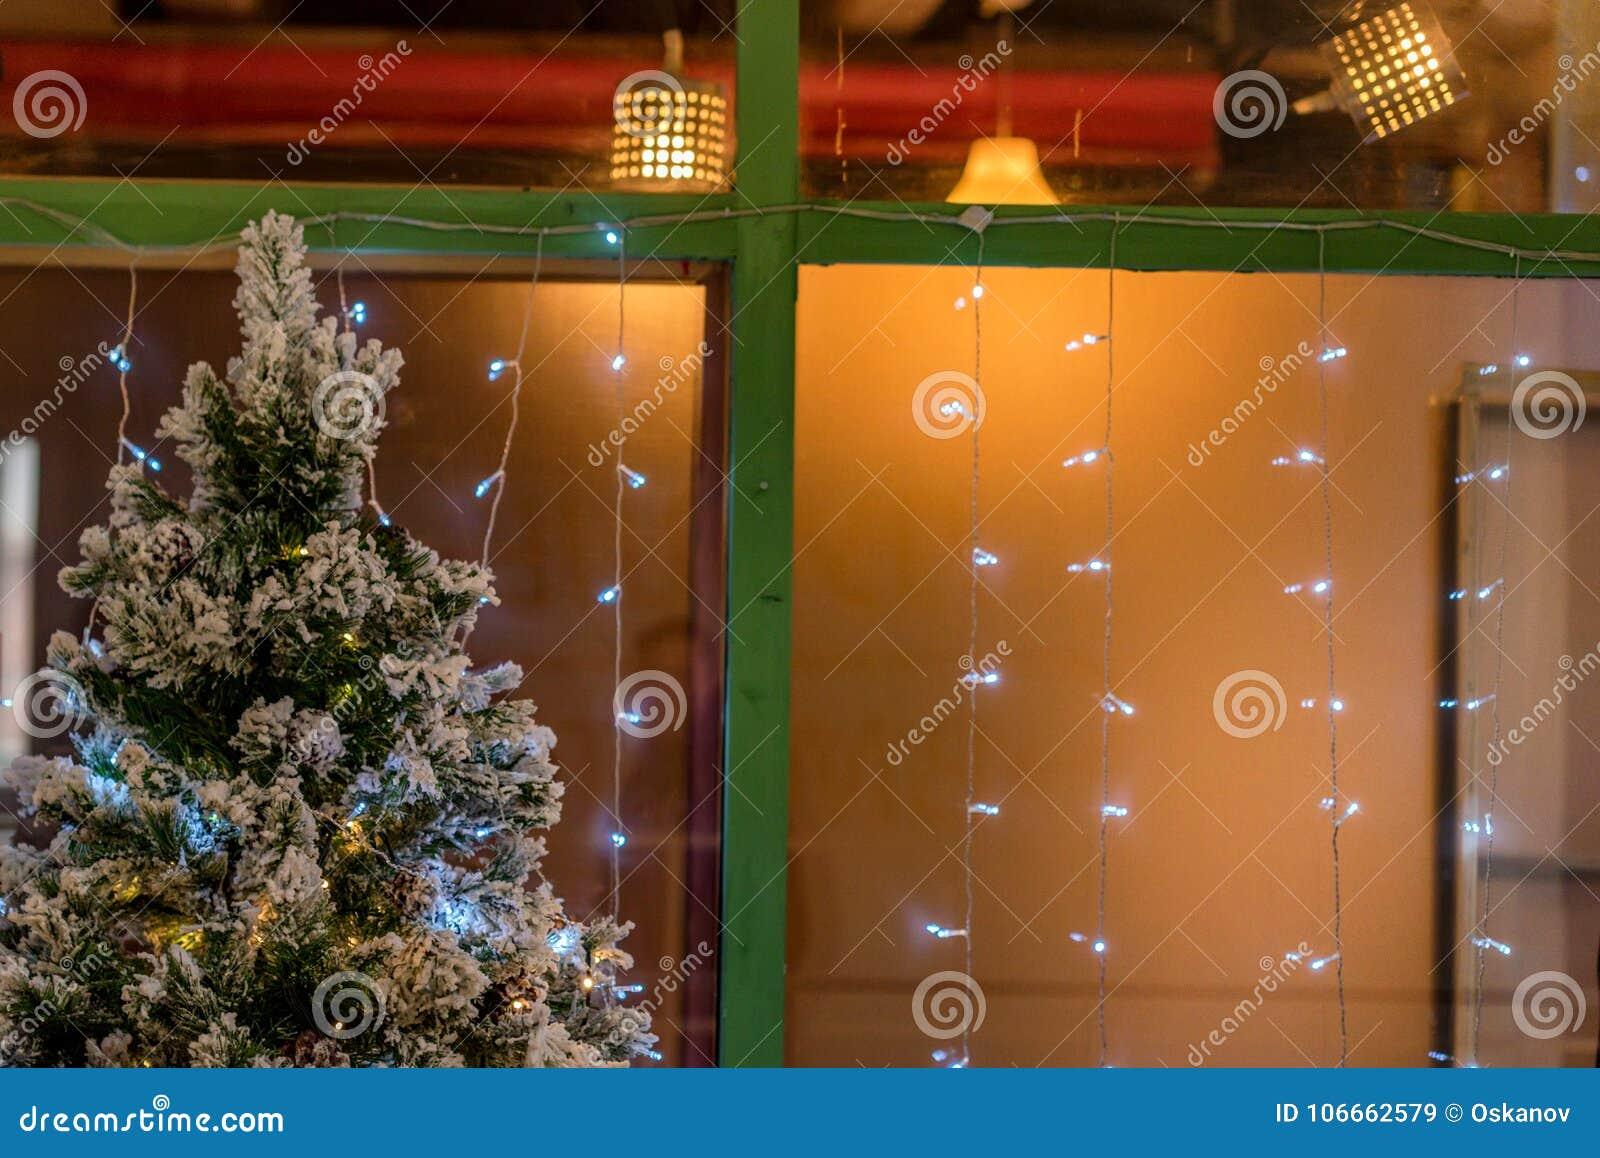 christmas lights and tree outside house